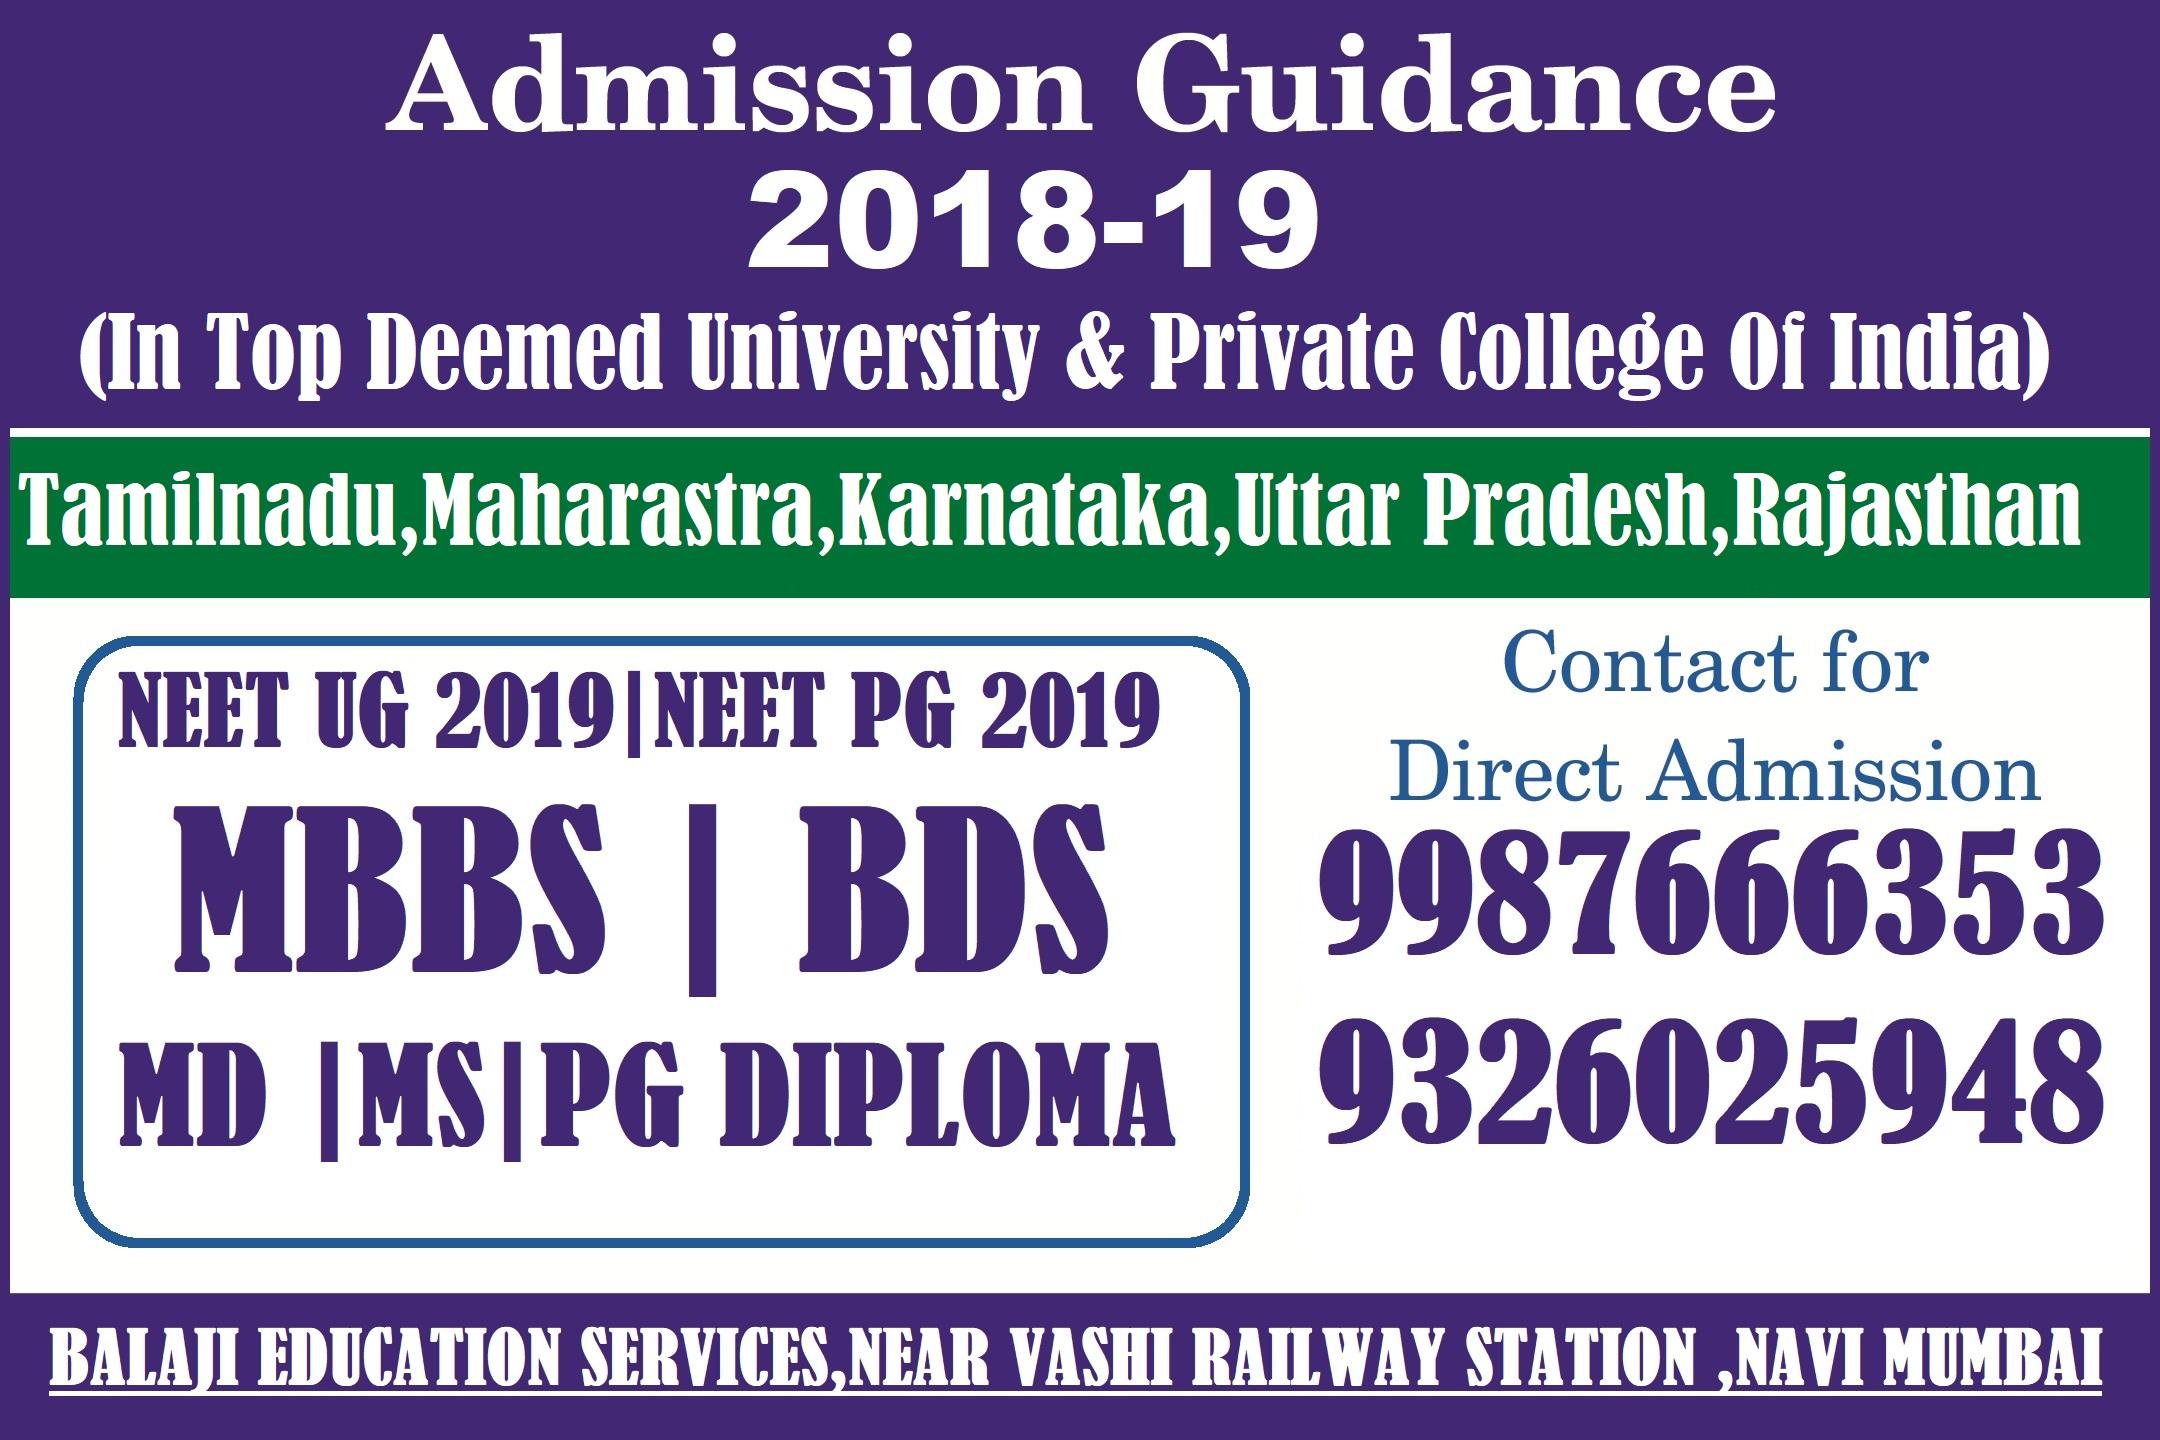 mbbs admission in bharati vidyapeeth medical college (BVDU) pune